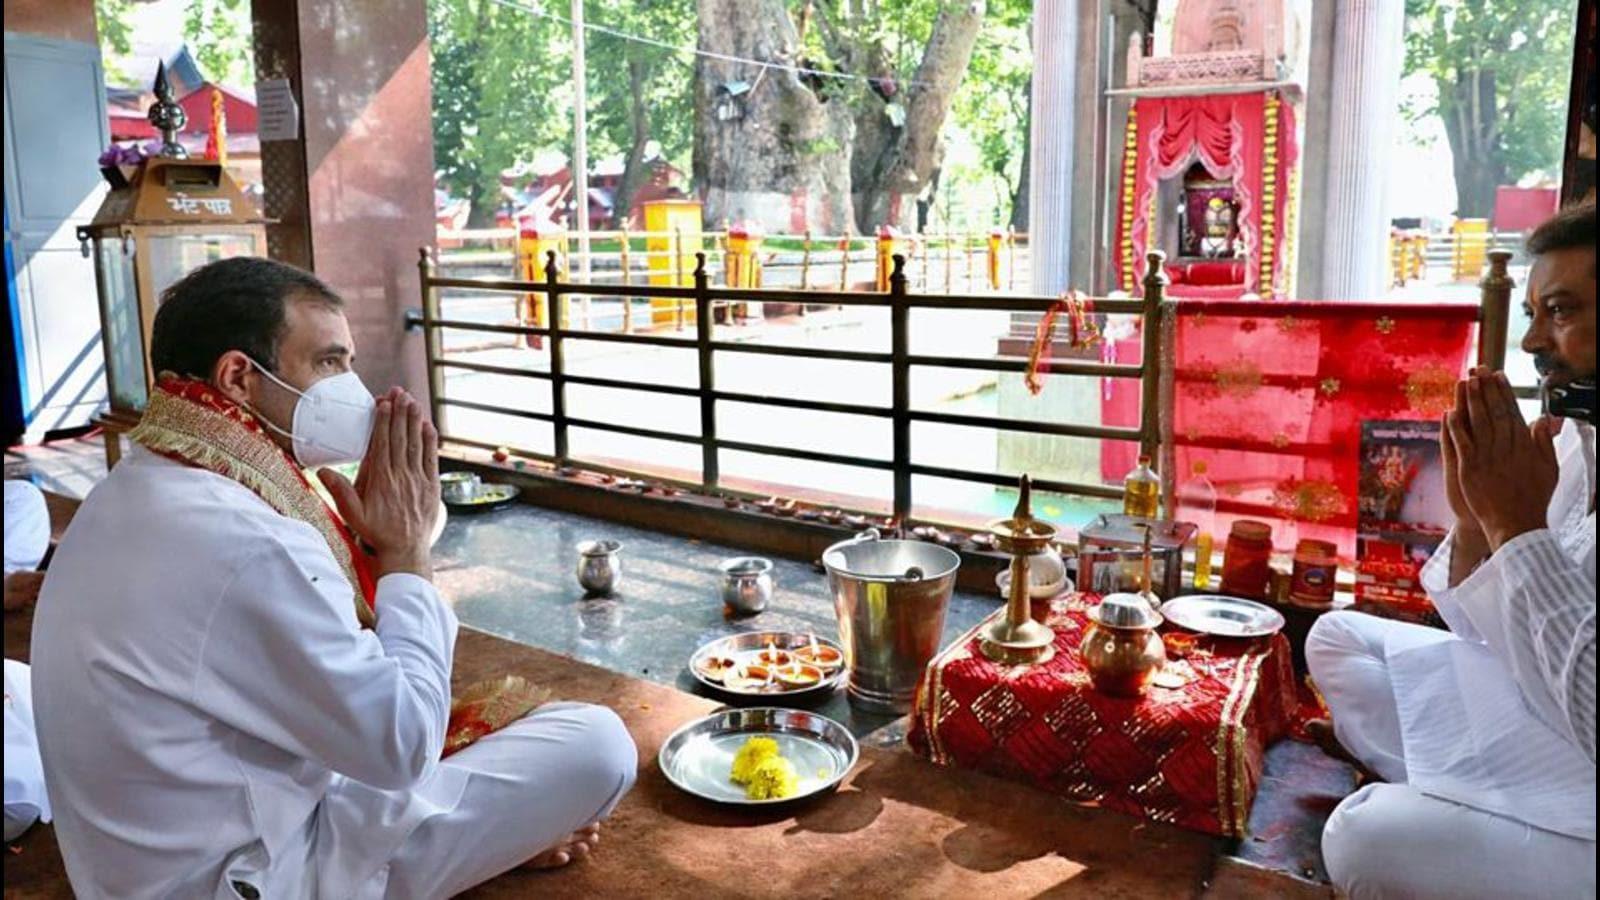 Rahul Gandhi Calls For Restoration Of J&K Statehood, BJP Says Political Appeasement In The Name Of Religion